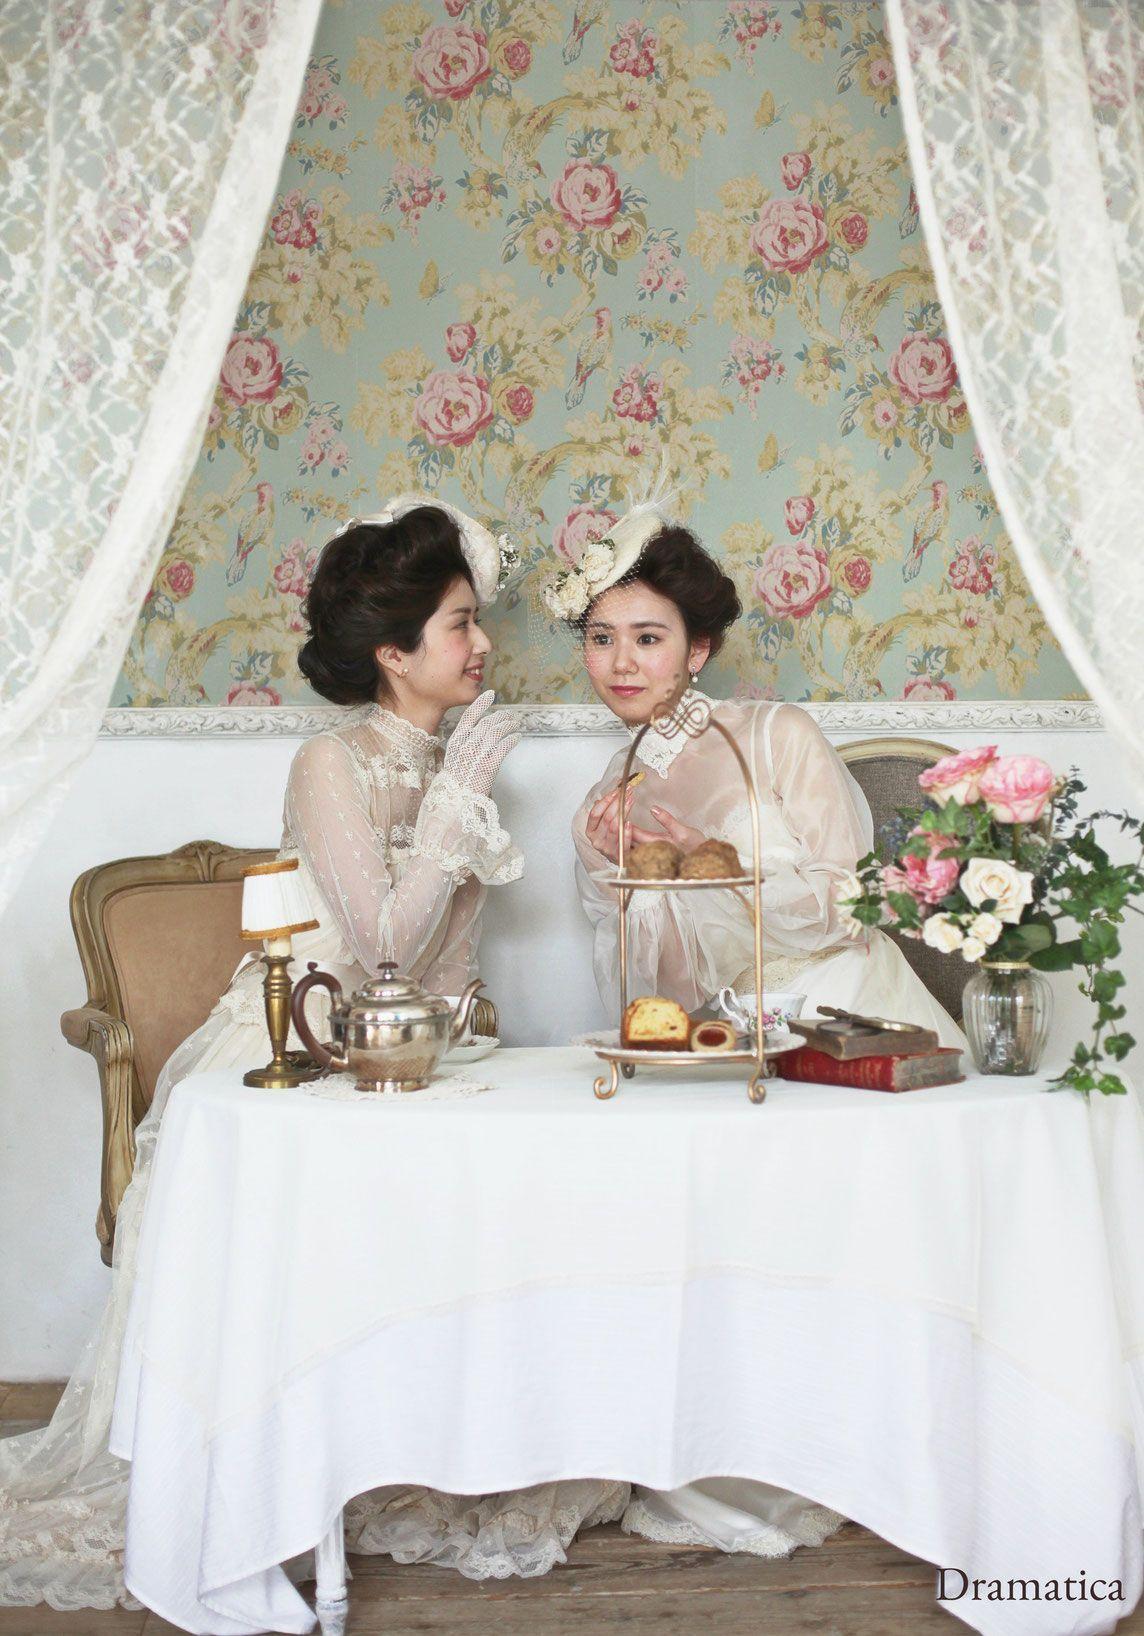 Victorian Tea Party Dramatica Vintage Wedding Dress Styling Rental English Tea [ 1636 x 1144 Pixel ]